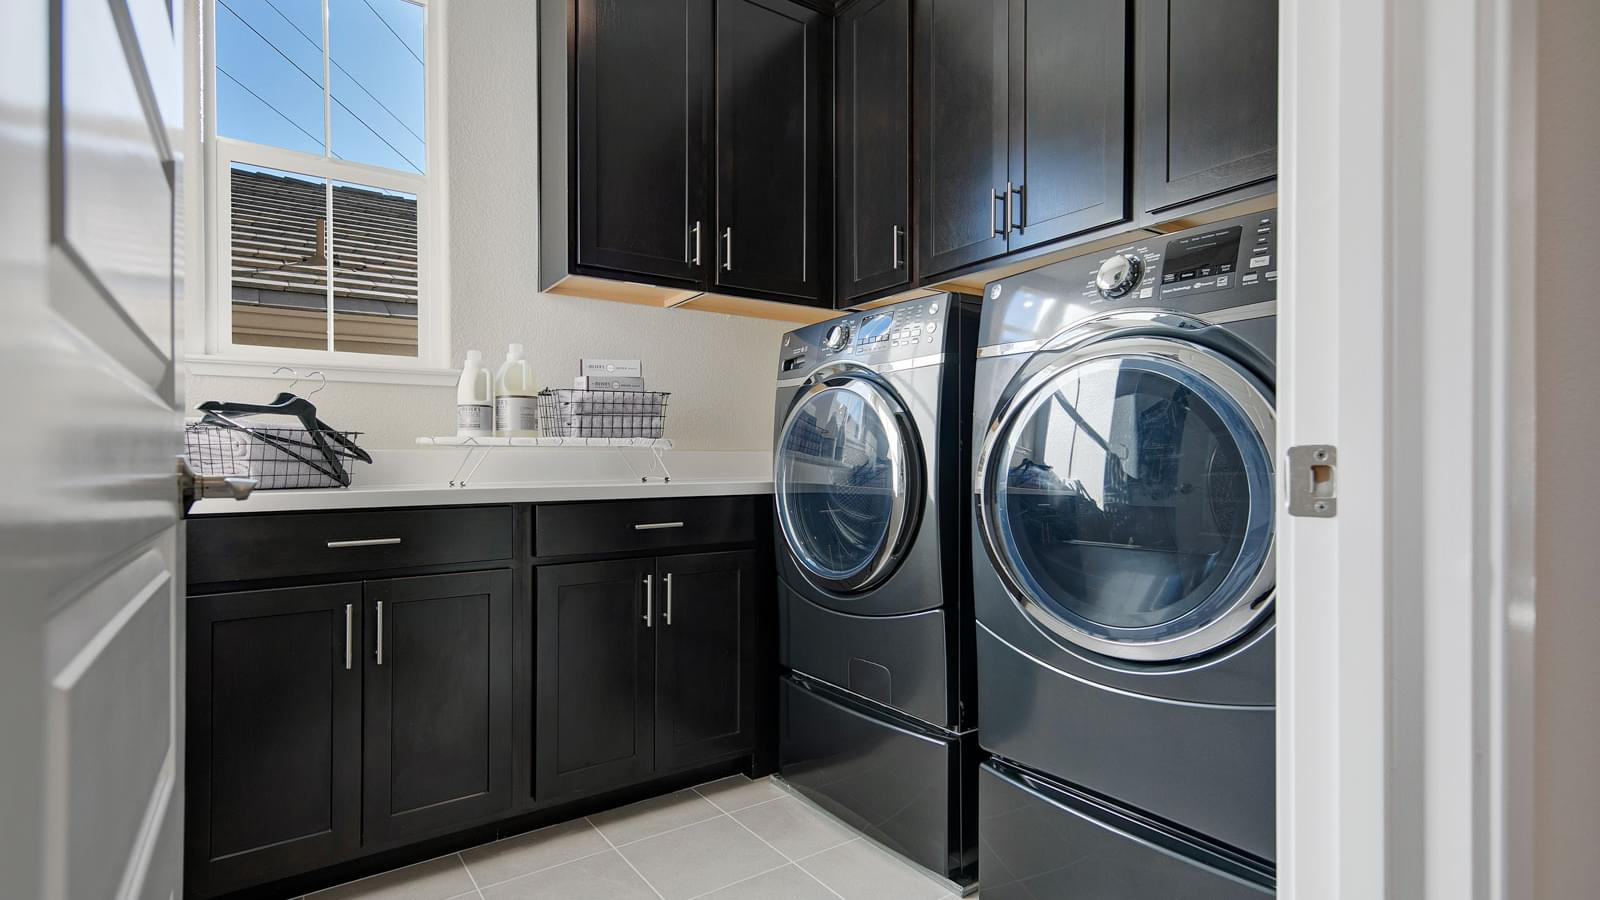 Residence 1 Laundry